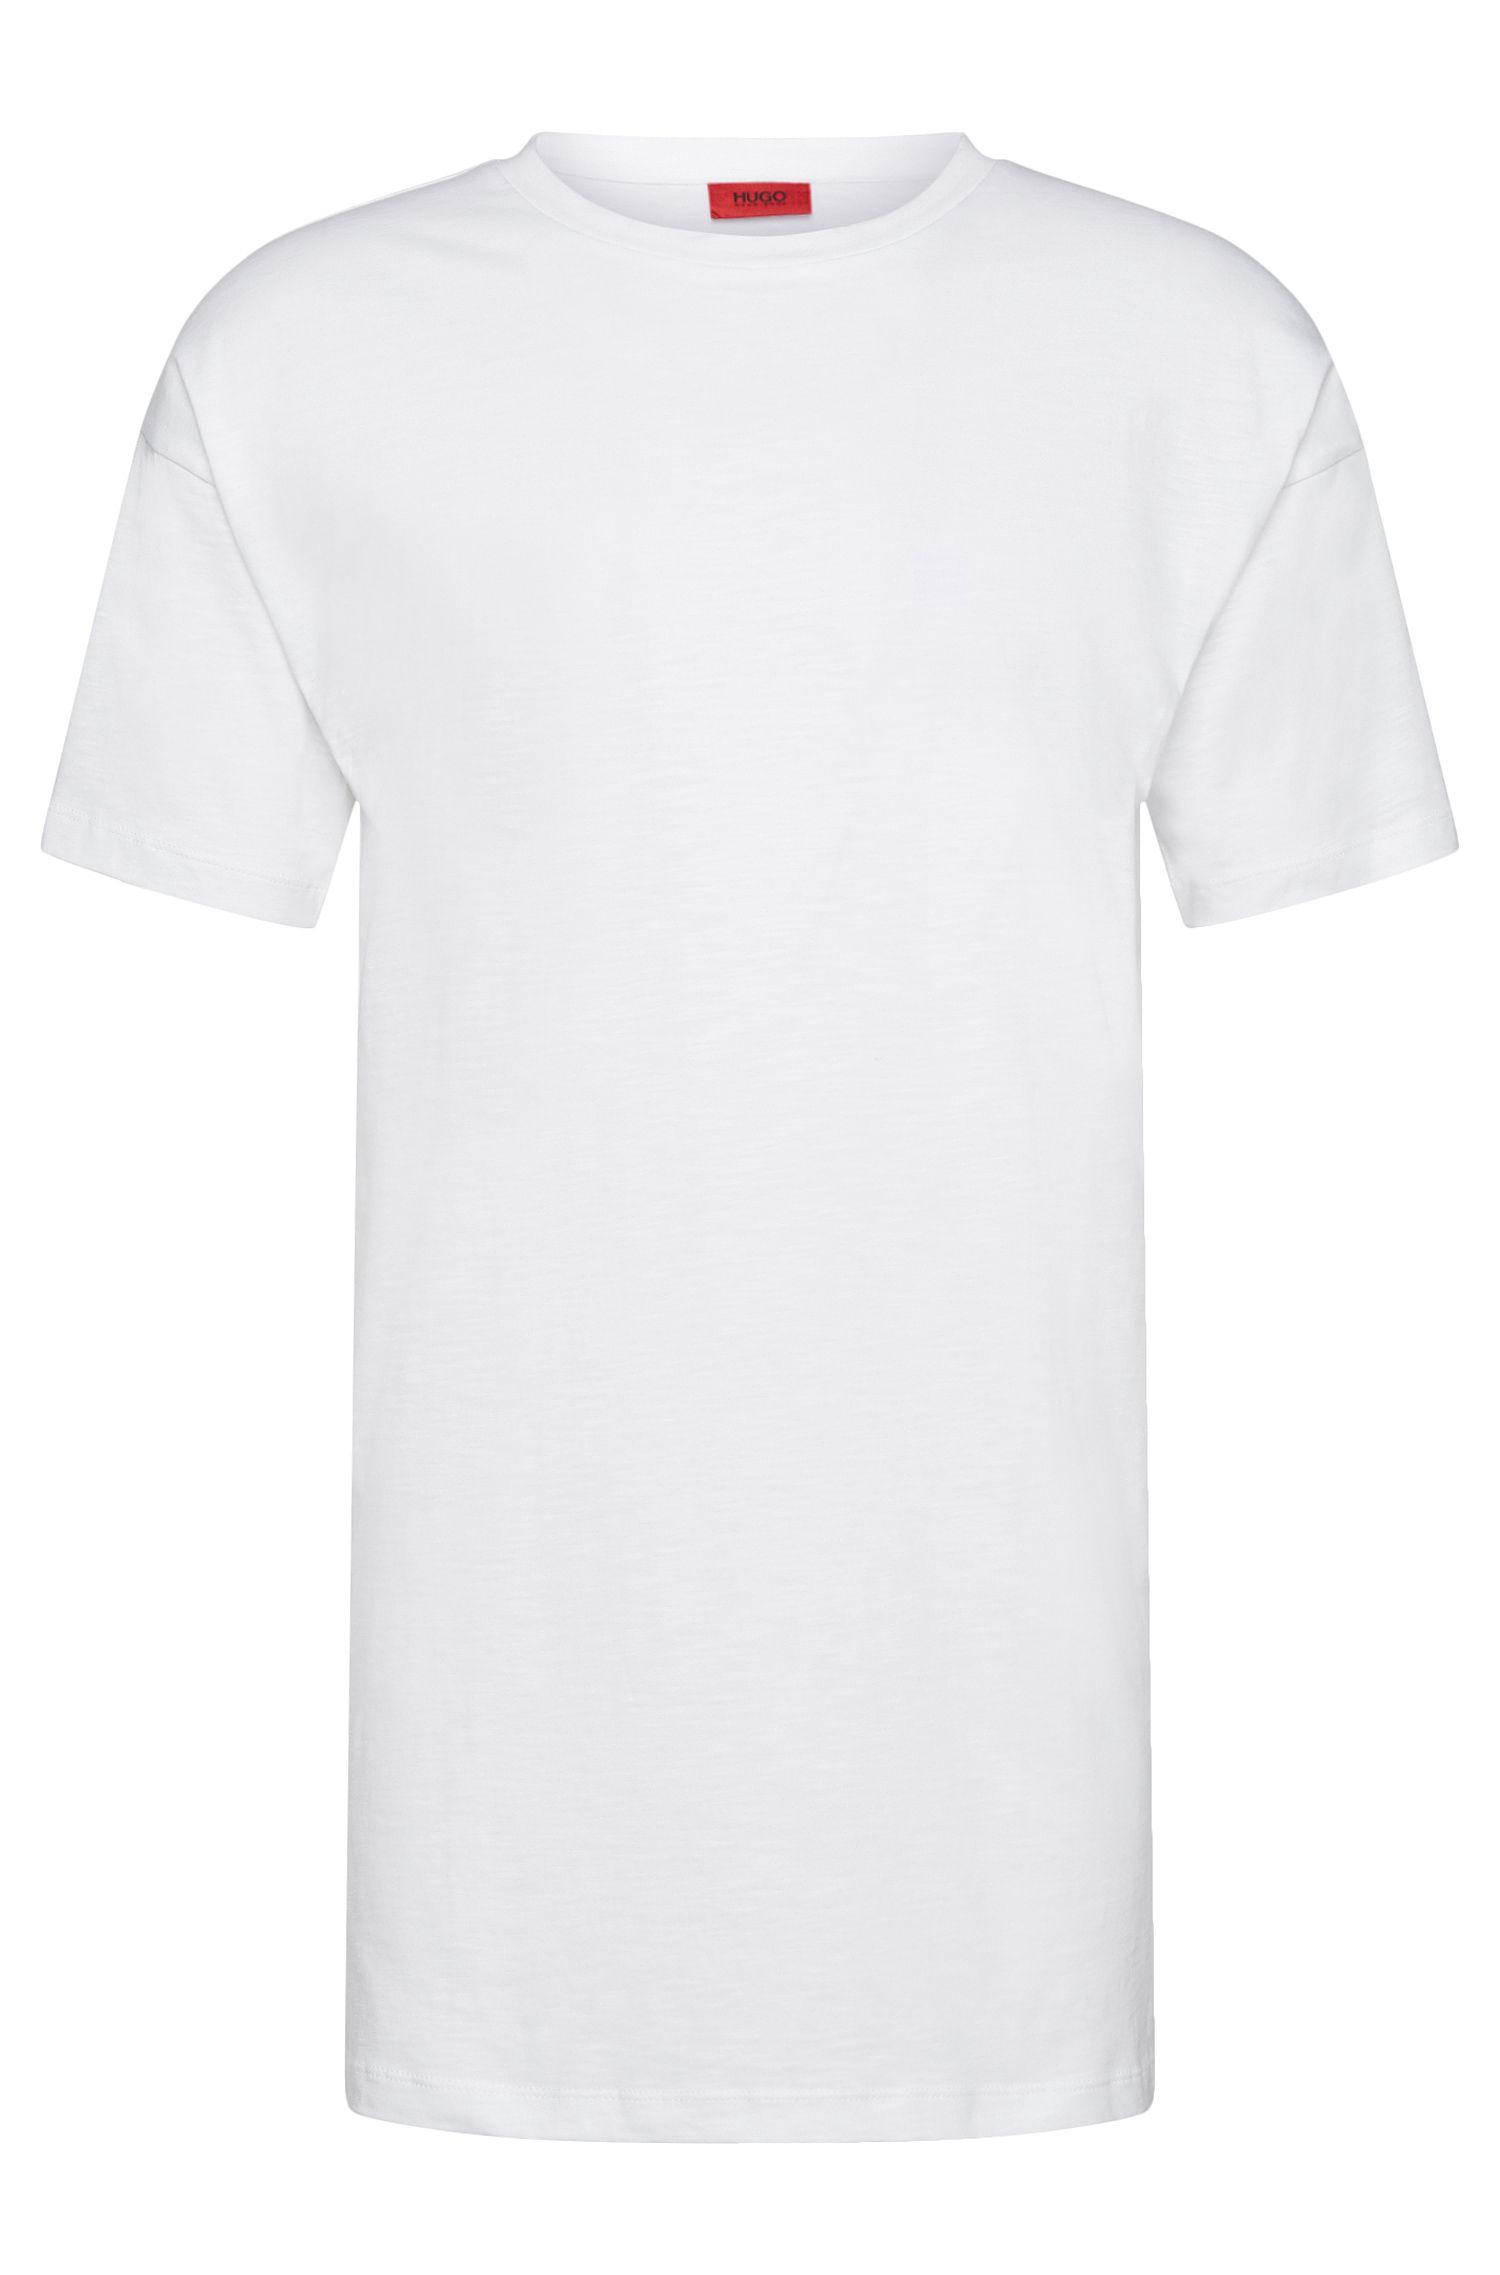 Relaxed-Fit T-Shirt aus Baumwolle in verlängerter Schnittform: 'Doracle'